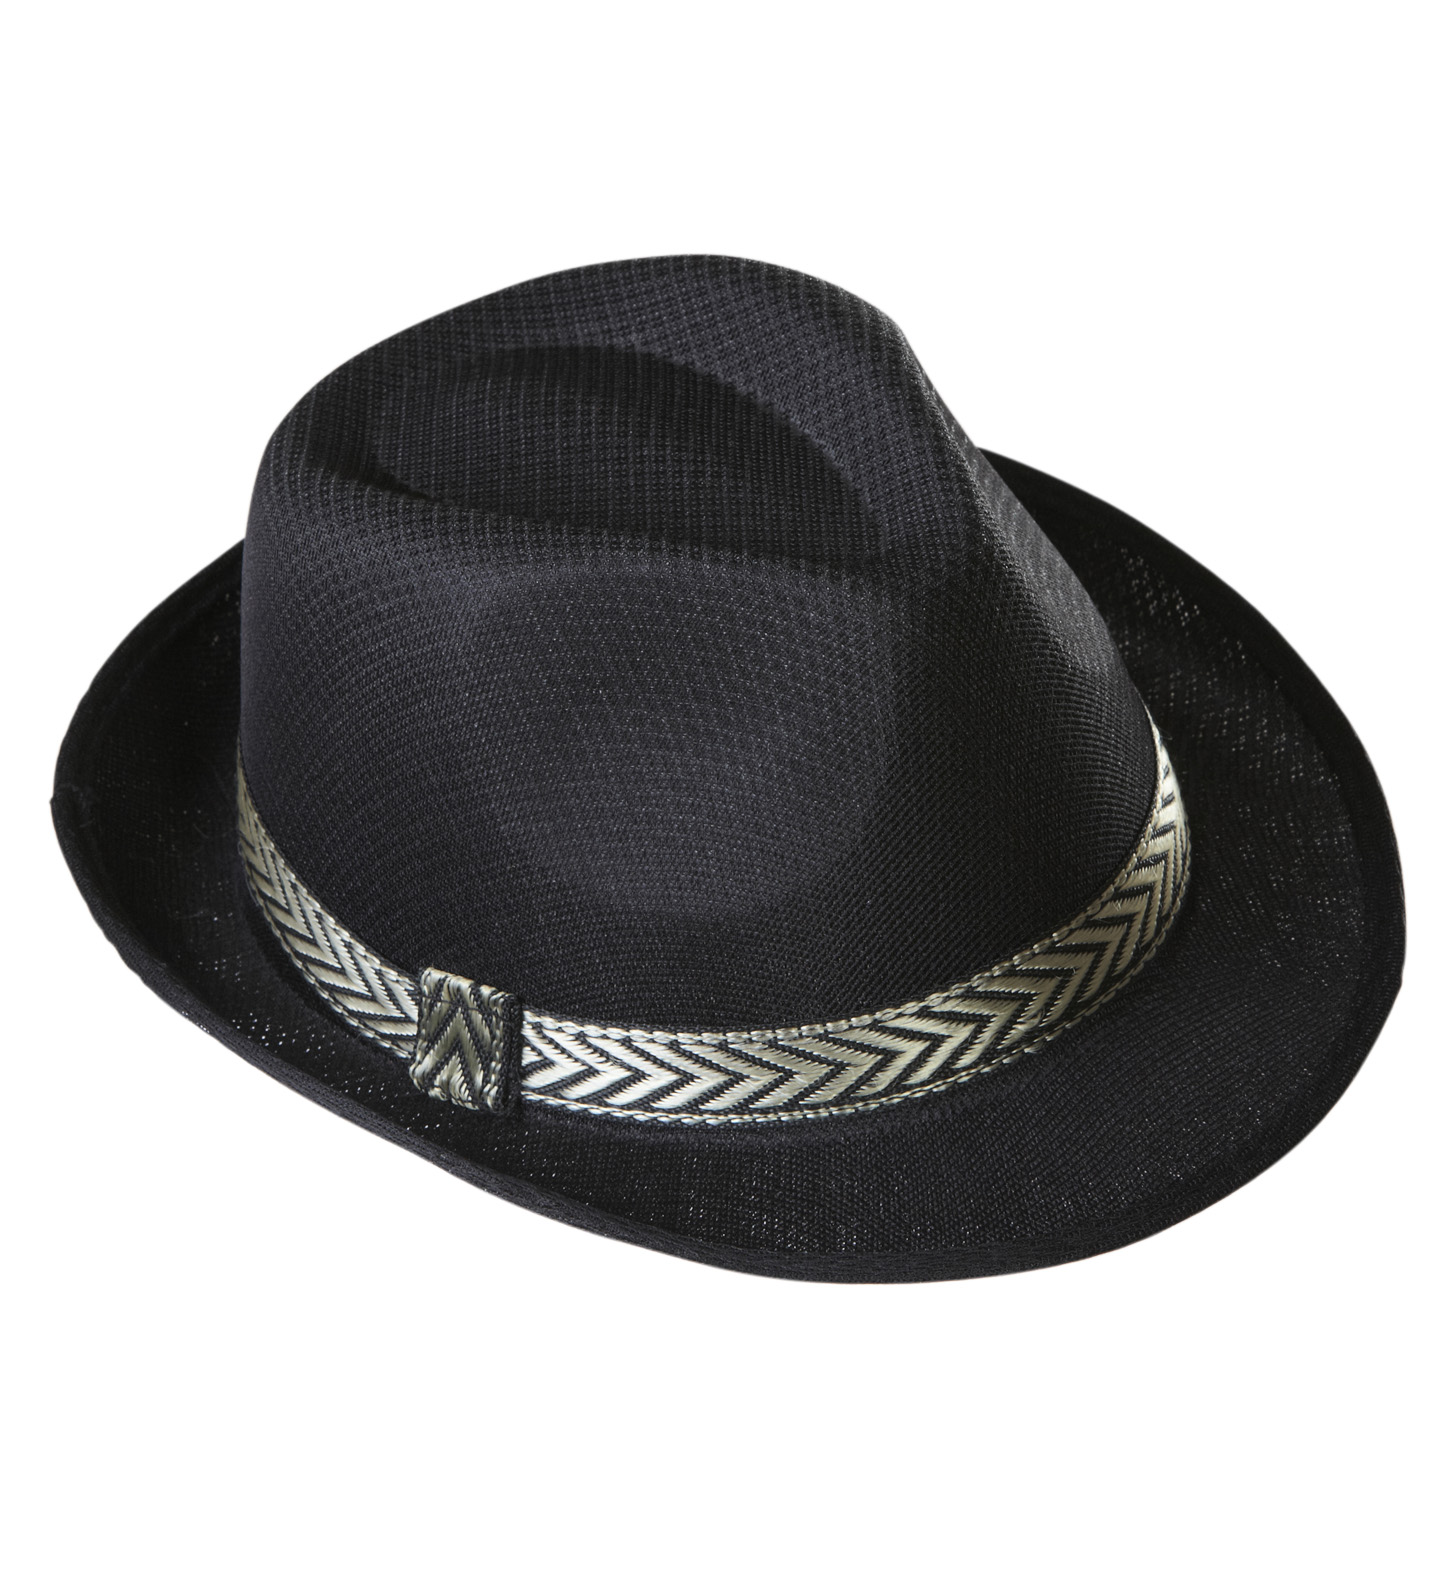 Black Panama Fedora Hat Fancy Dress